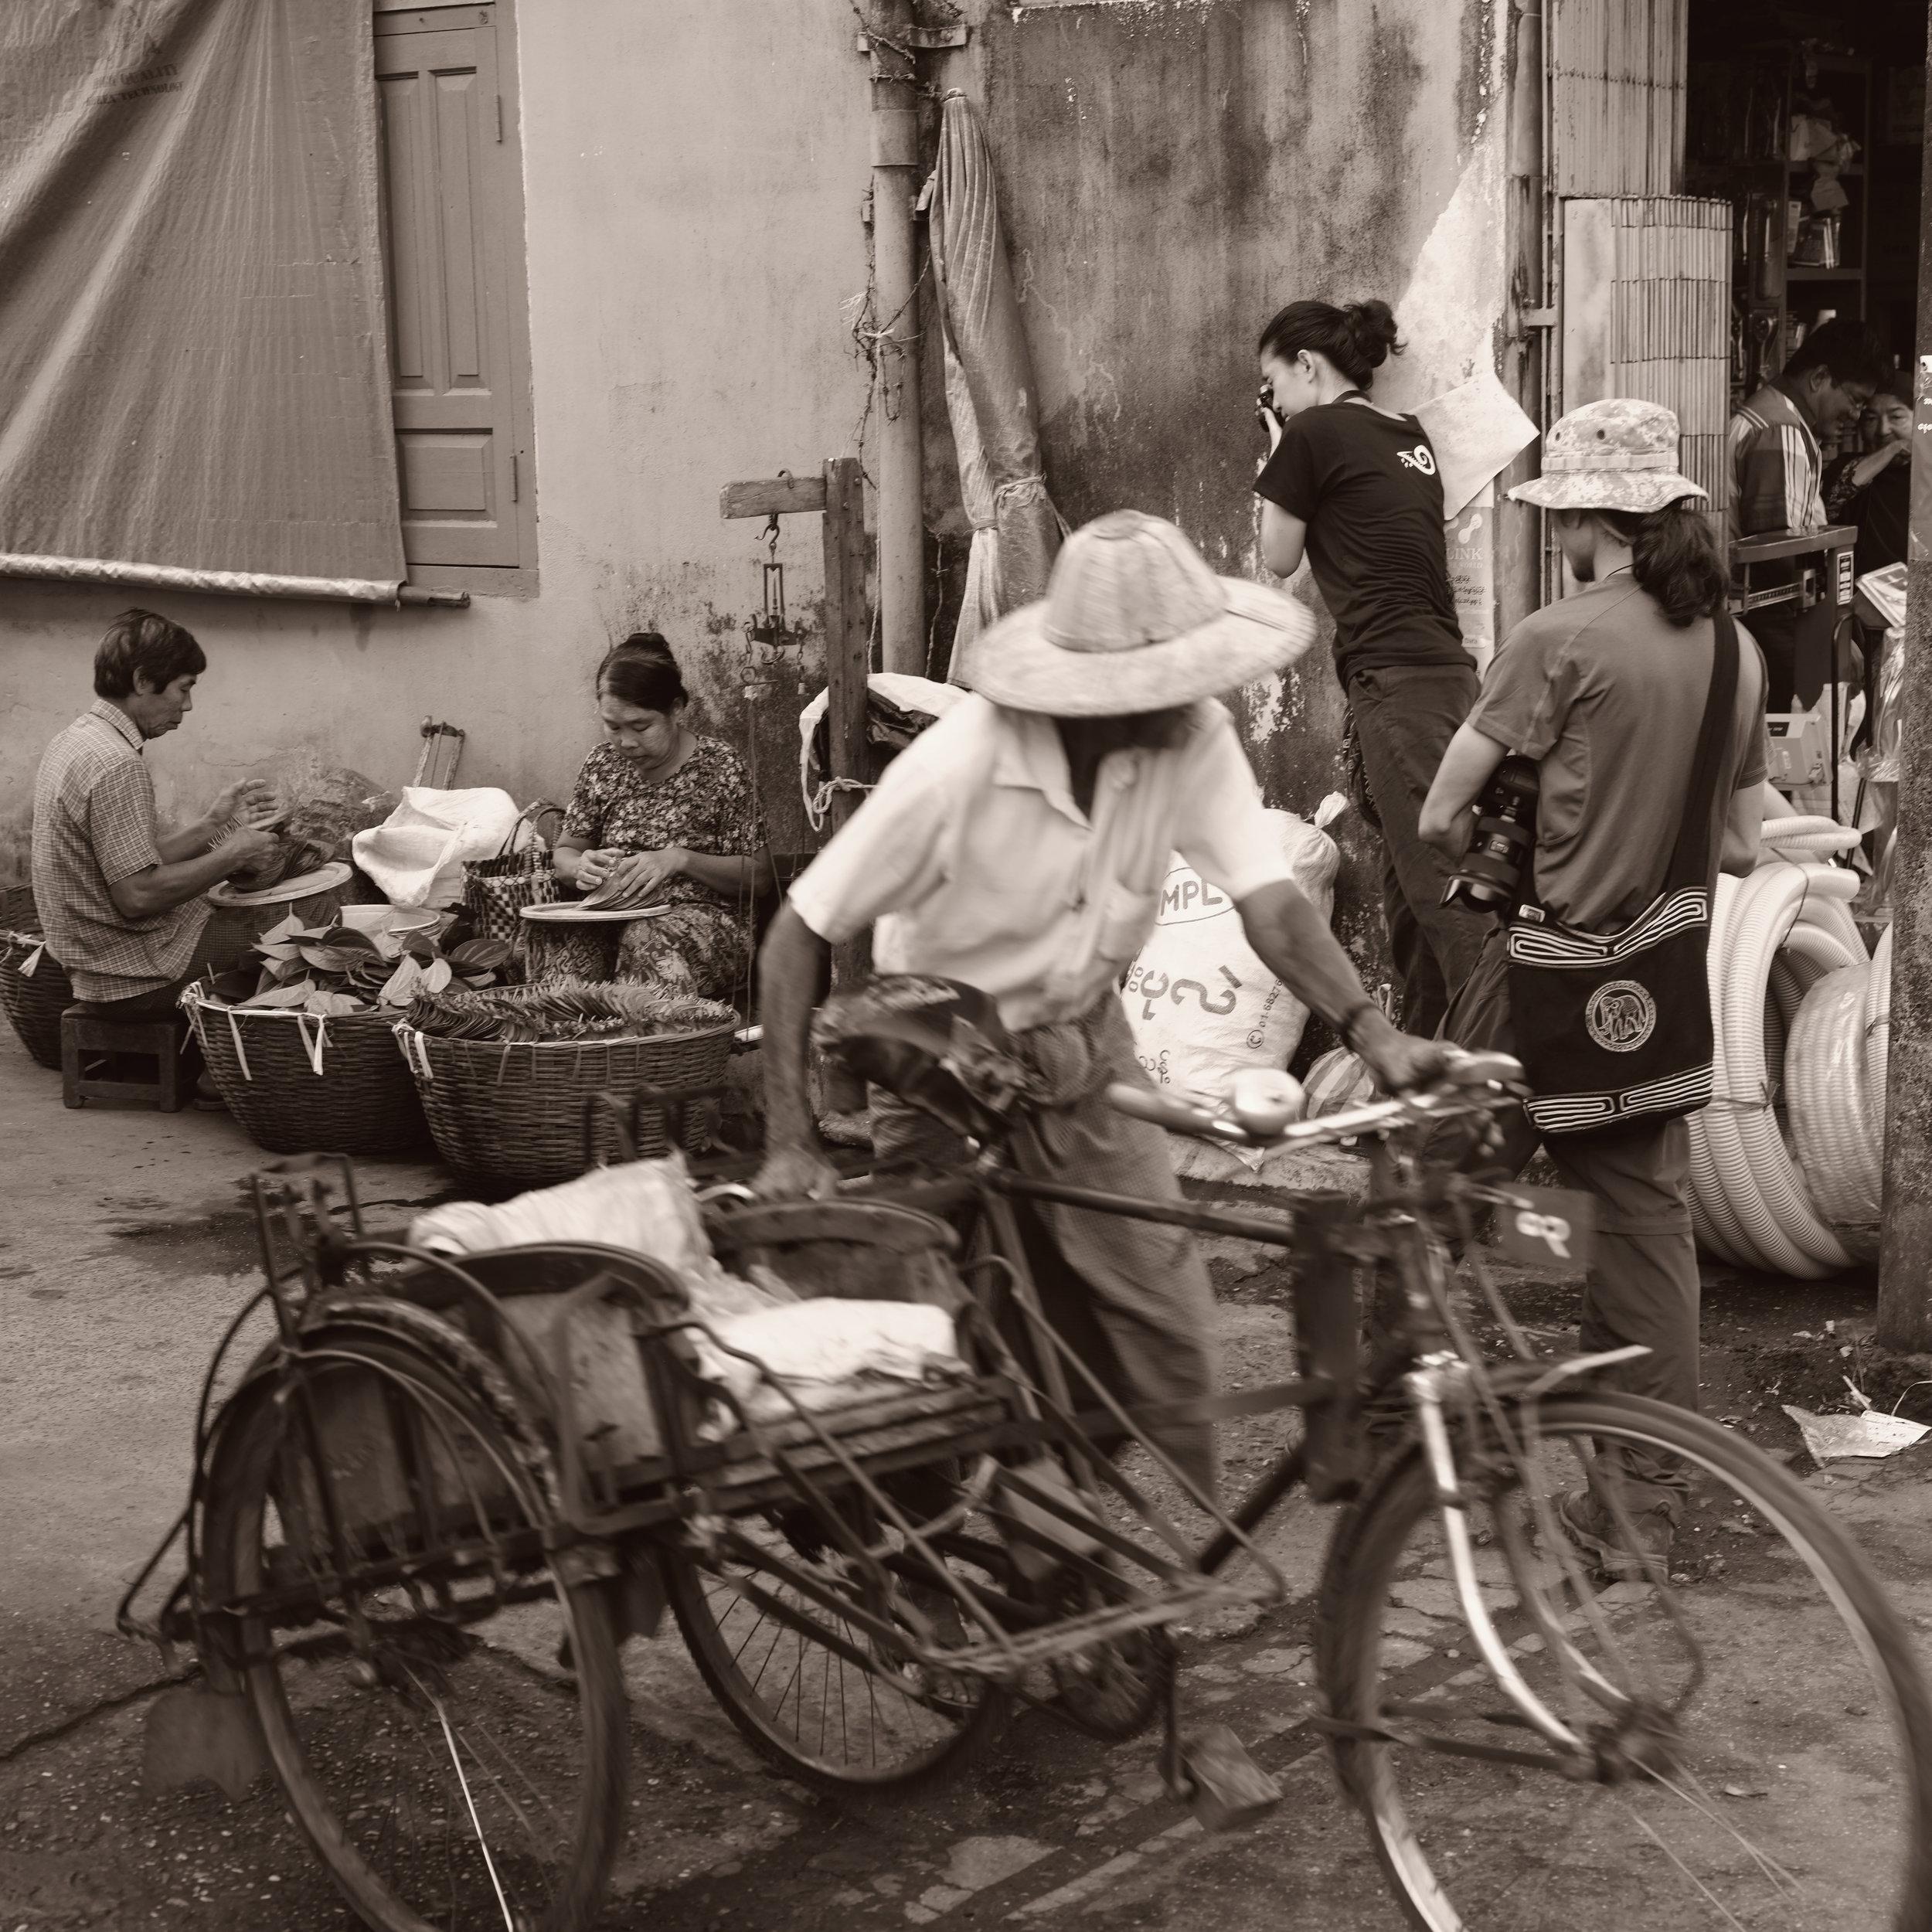 Rita Khin and Ko Myo shooting in Moulmein. © PB